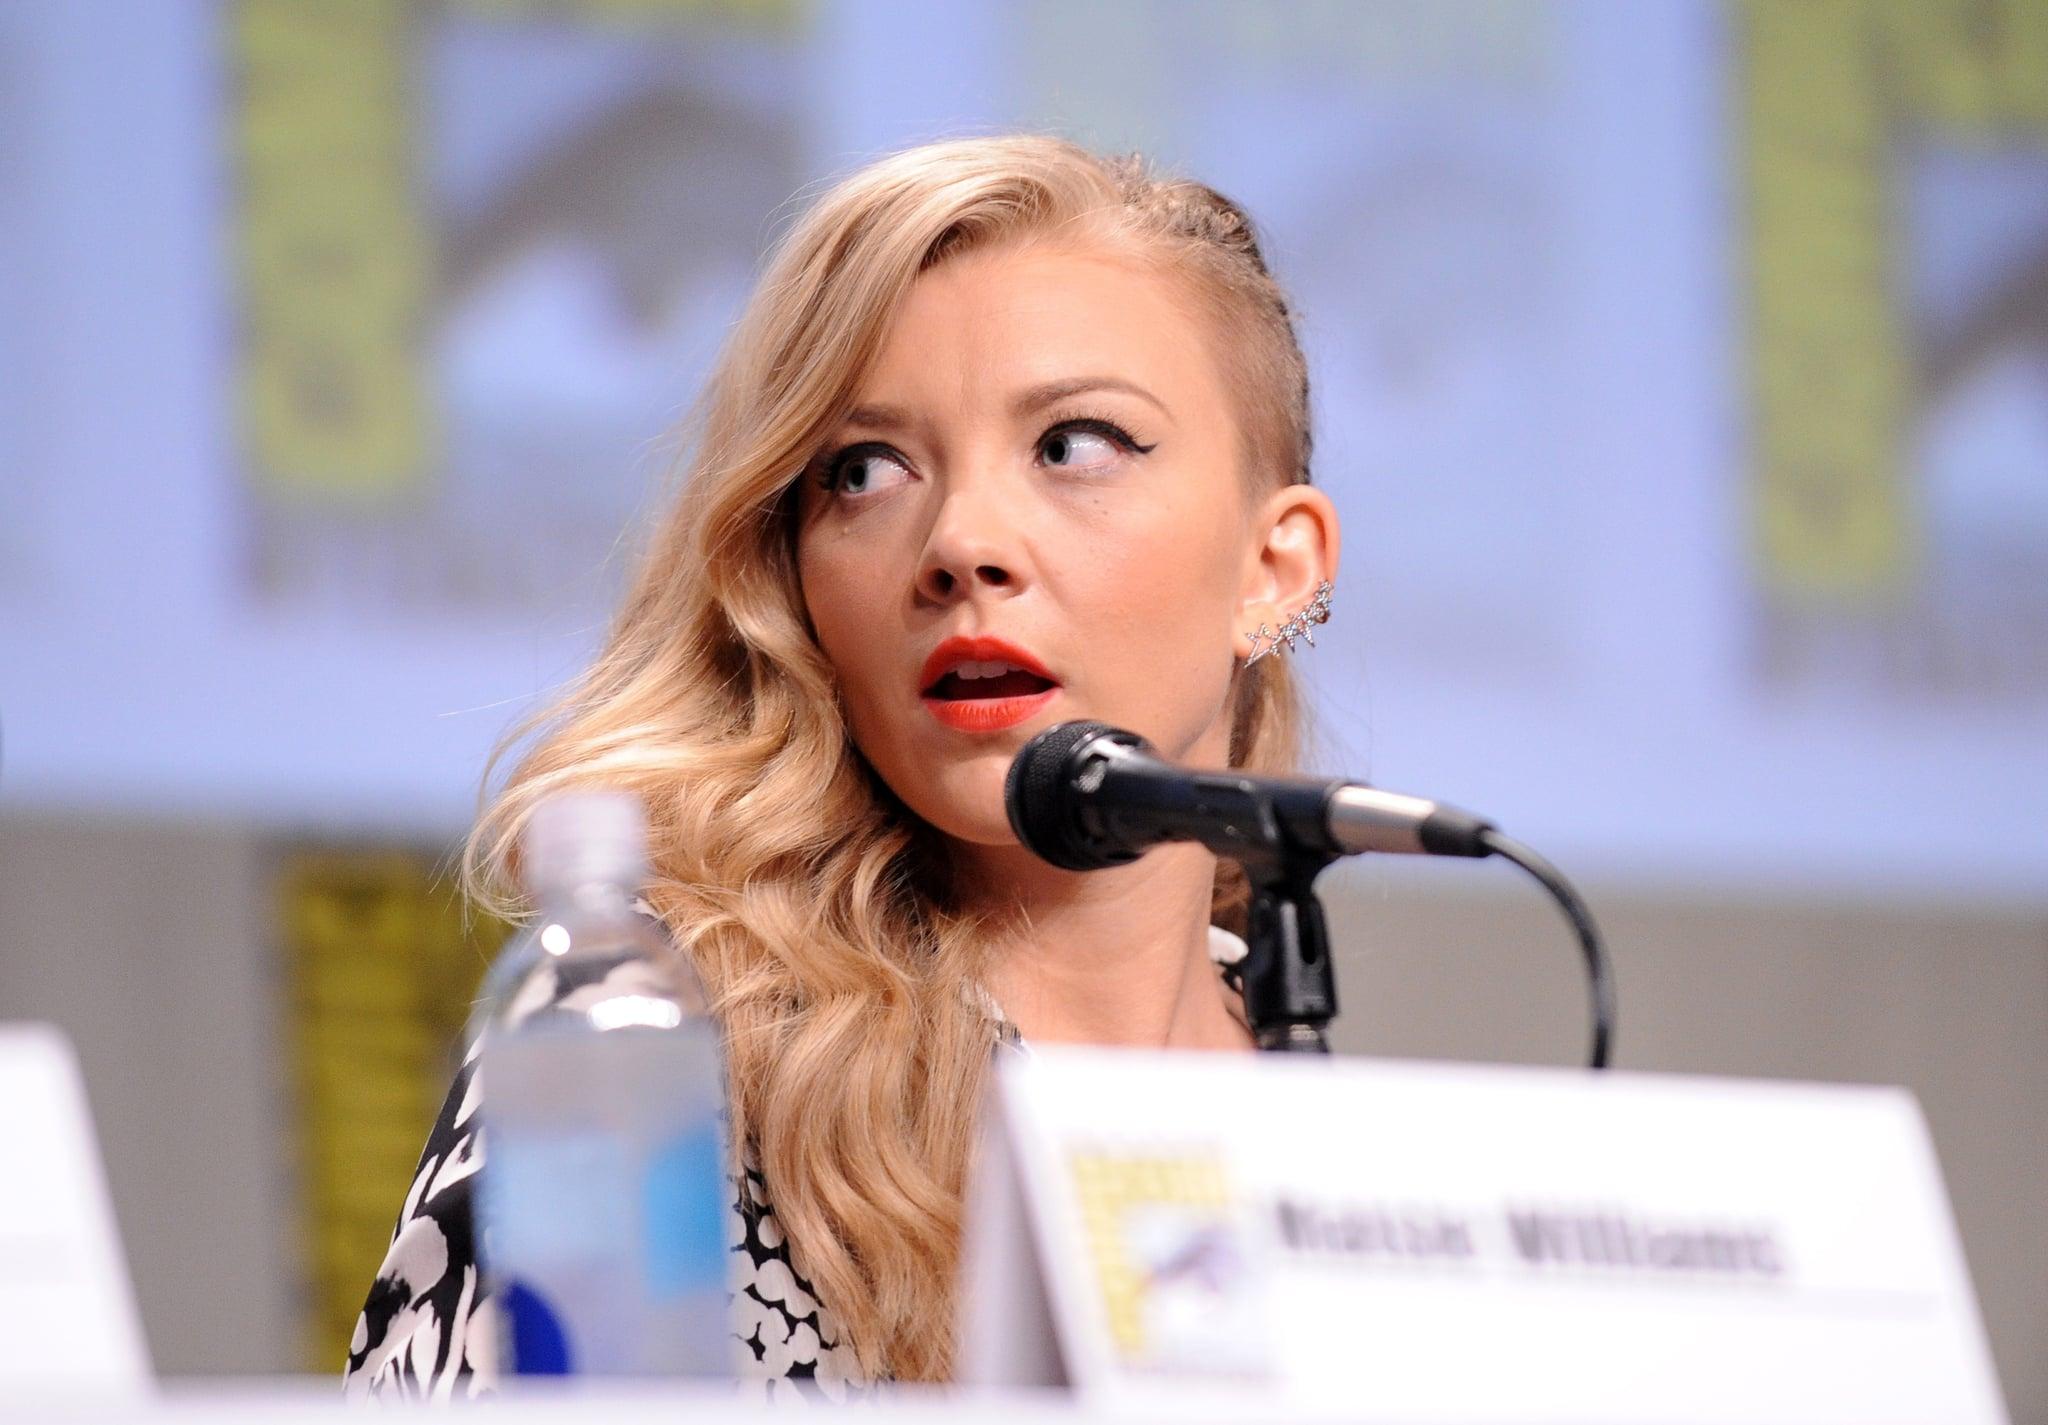 Natalie Dormer, Margaery Tyrell of Game of Thrones, Cressida of Hunger Games